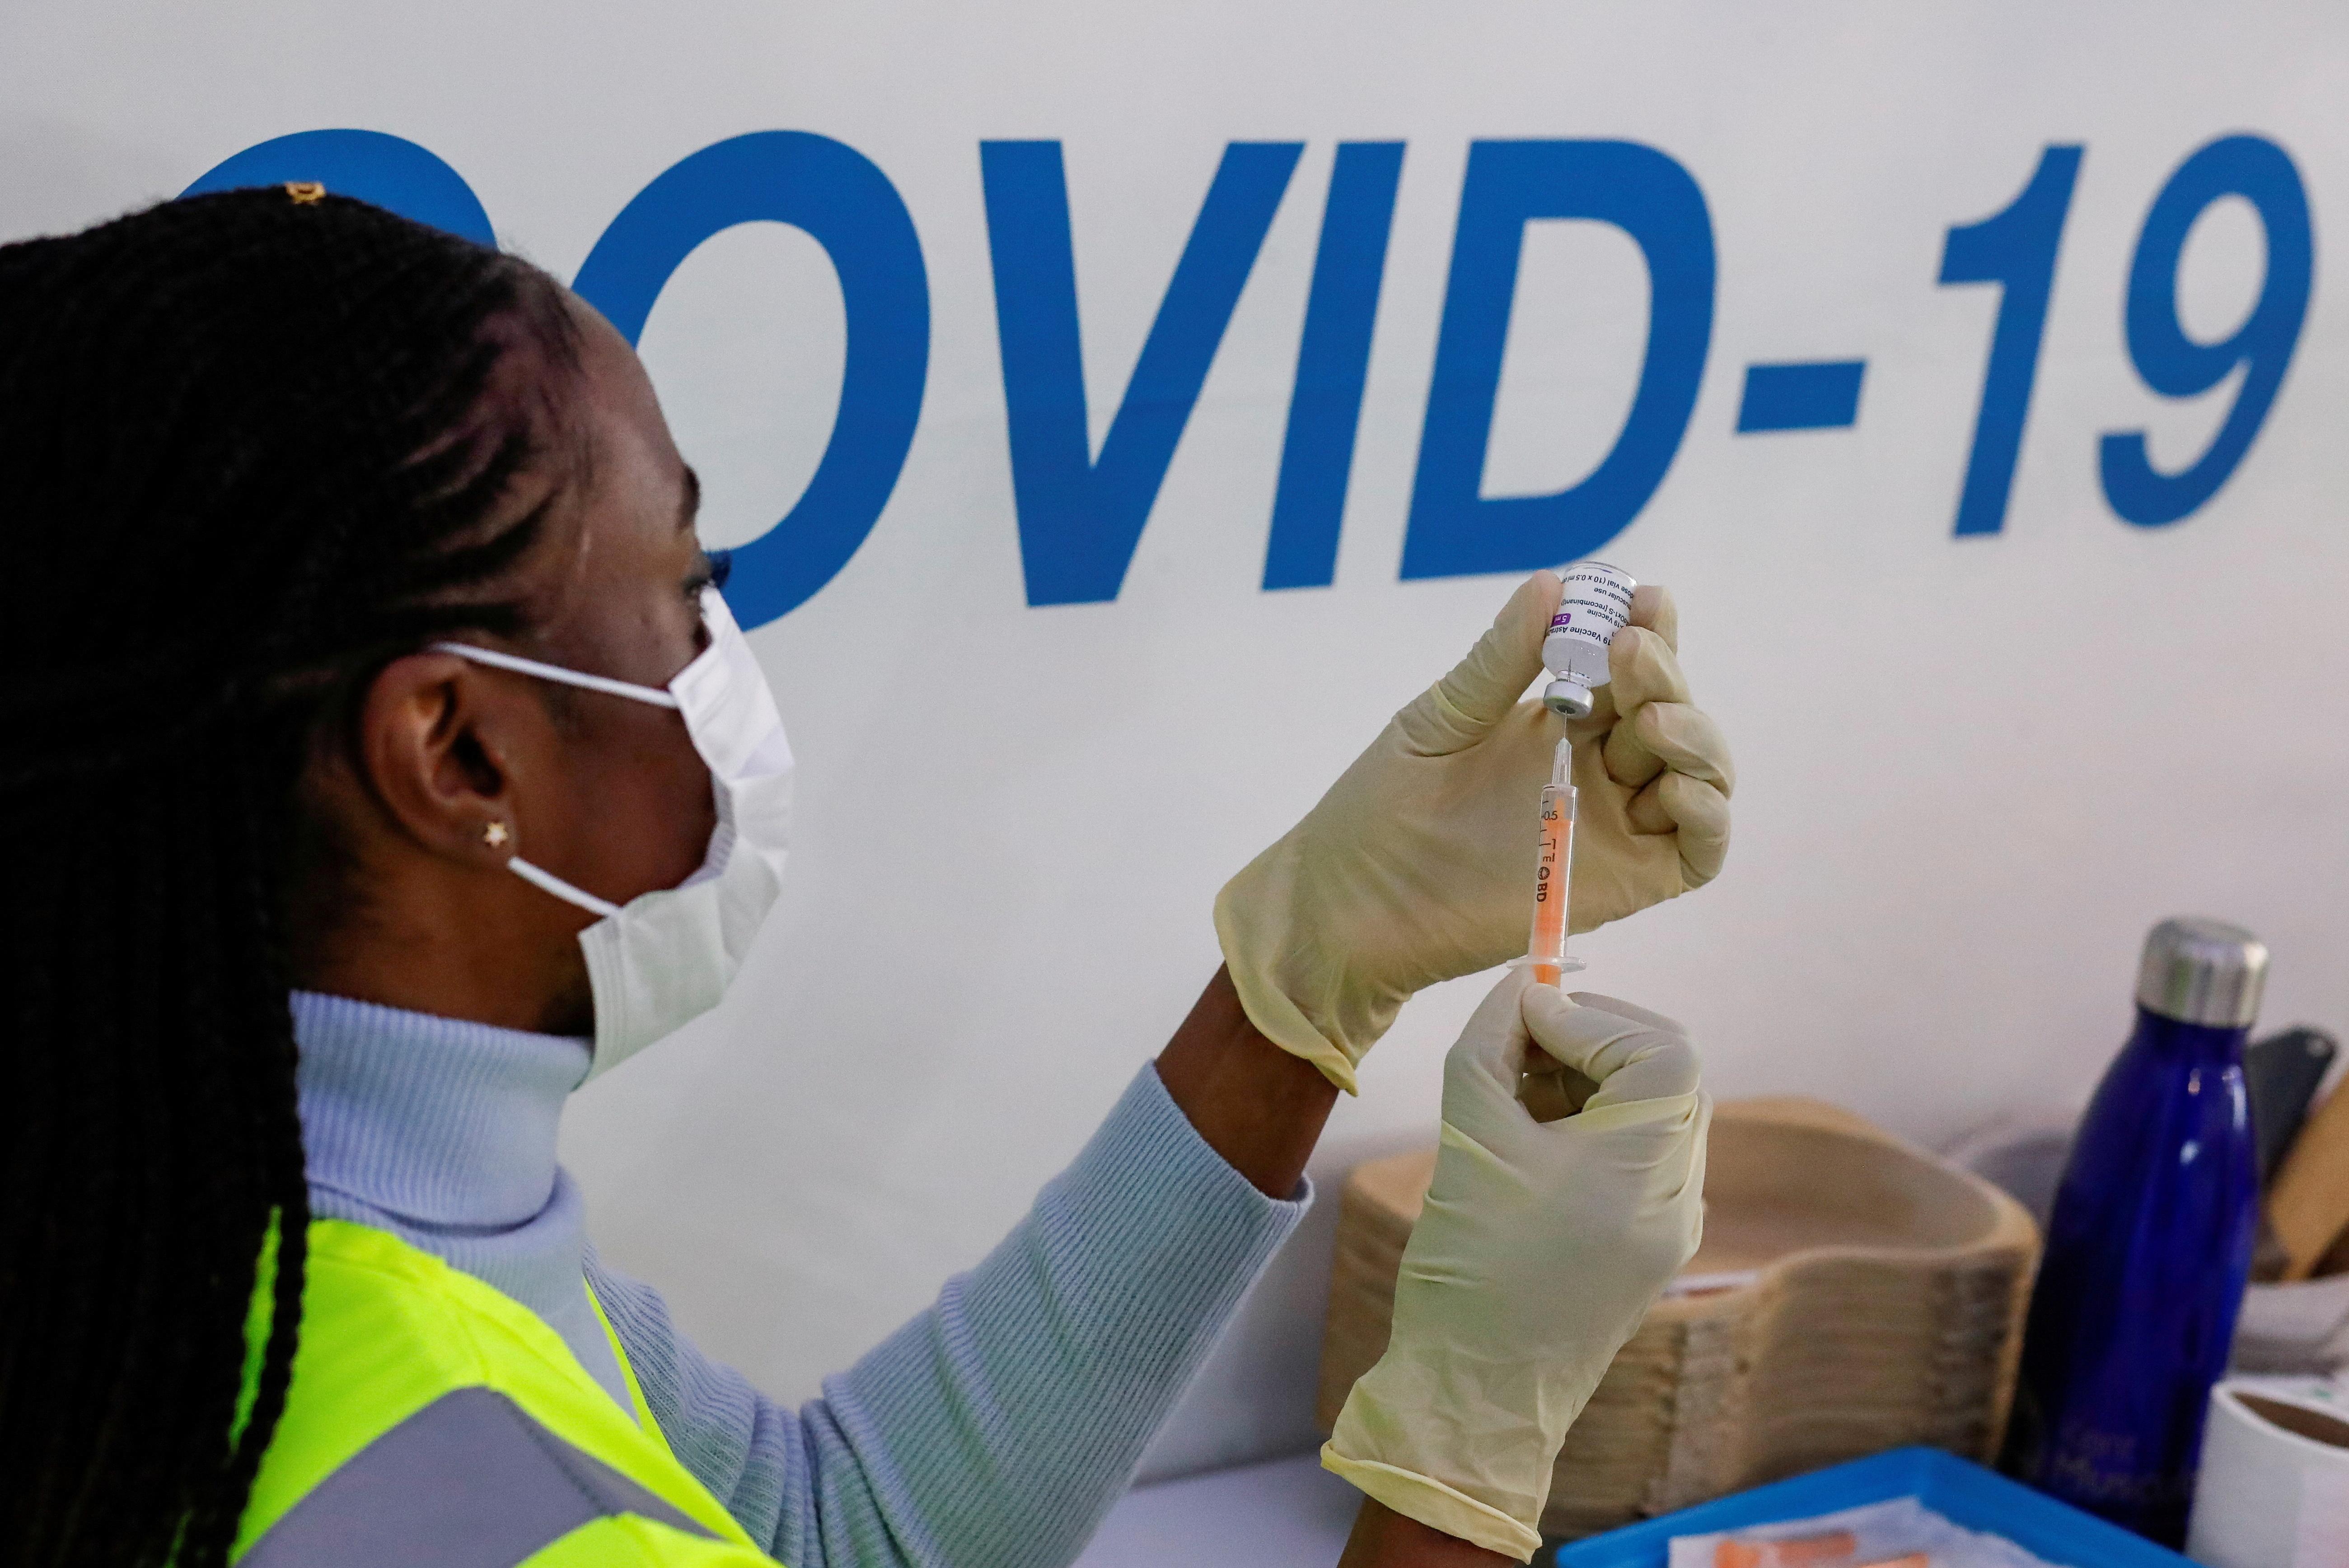 A dose of AstraZeneca vaccine is prepared at COVID-19 vaccination centre in the Odeon Luxe Cinema in Maidstone, Britain February 10, 2021. REUTERS/Andrew Couldridge/File Photo